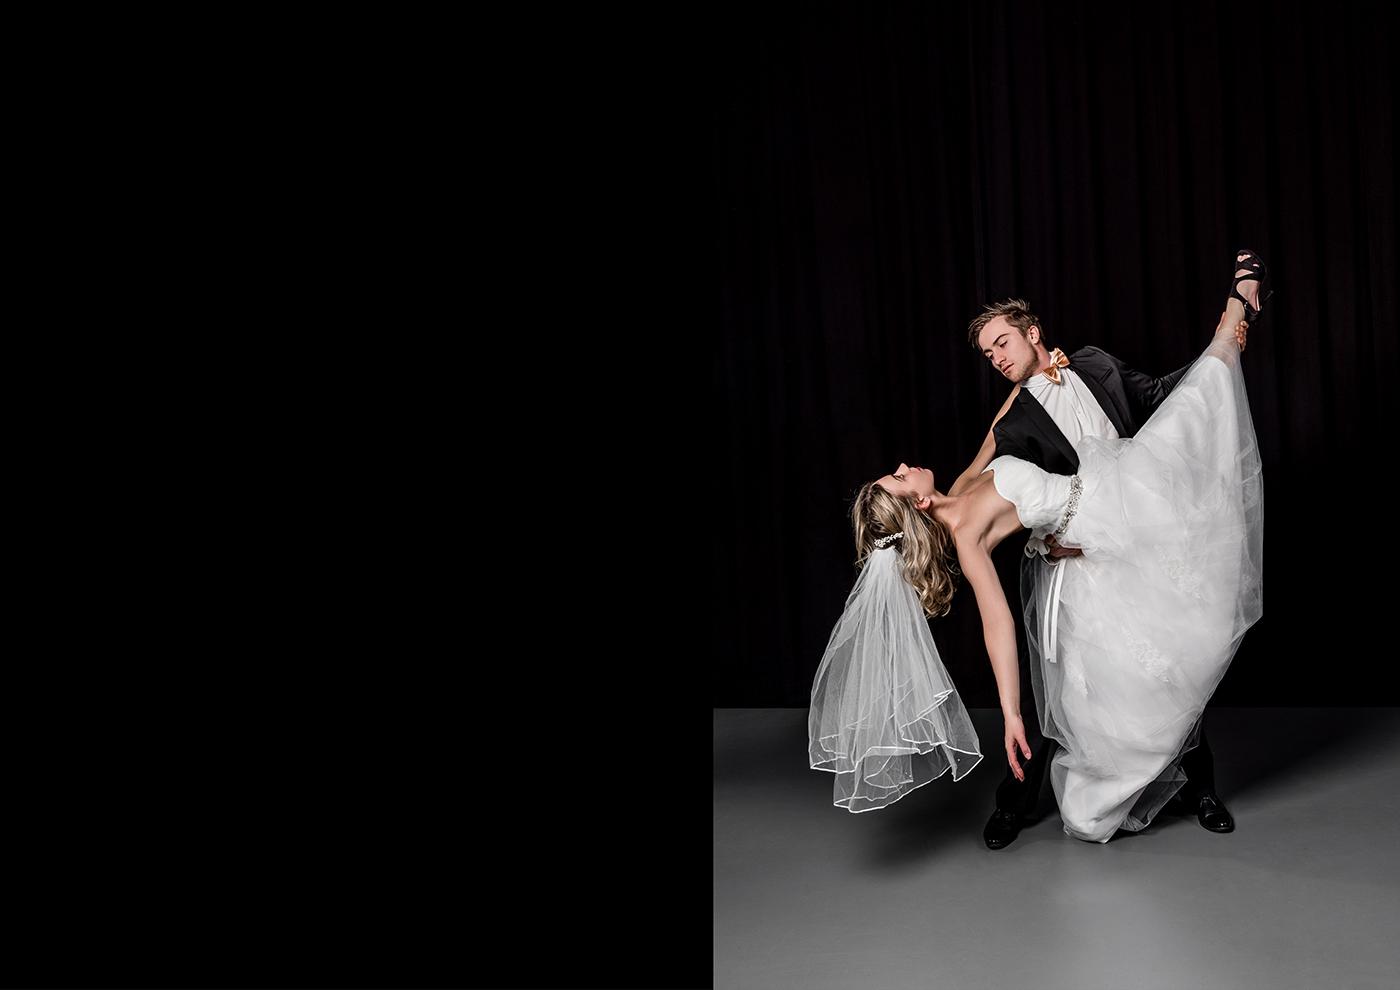 adobeawards Wedding Photography dance photography graduation project WEDDING DRESS wedding DANCE   Love